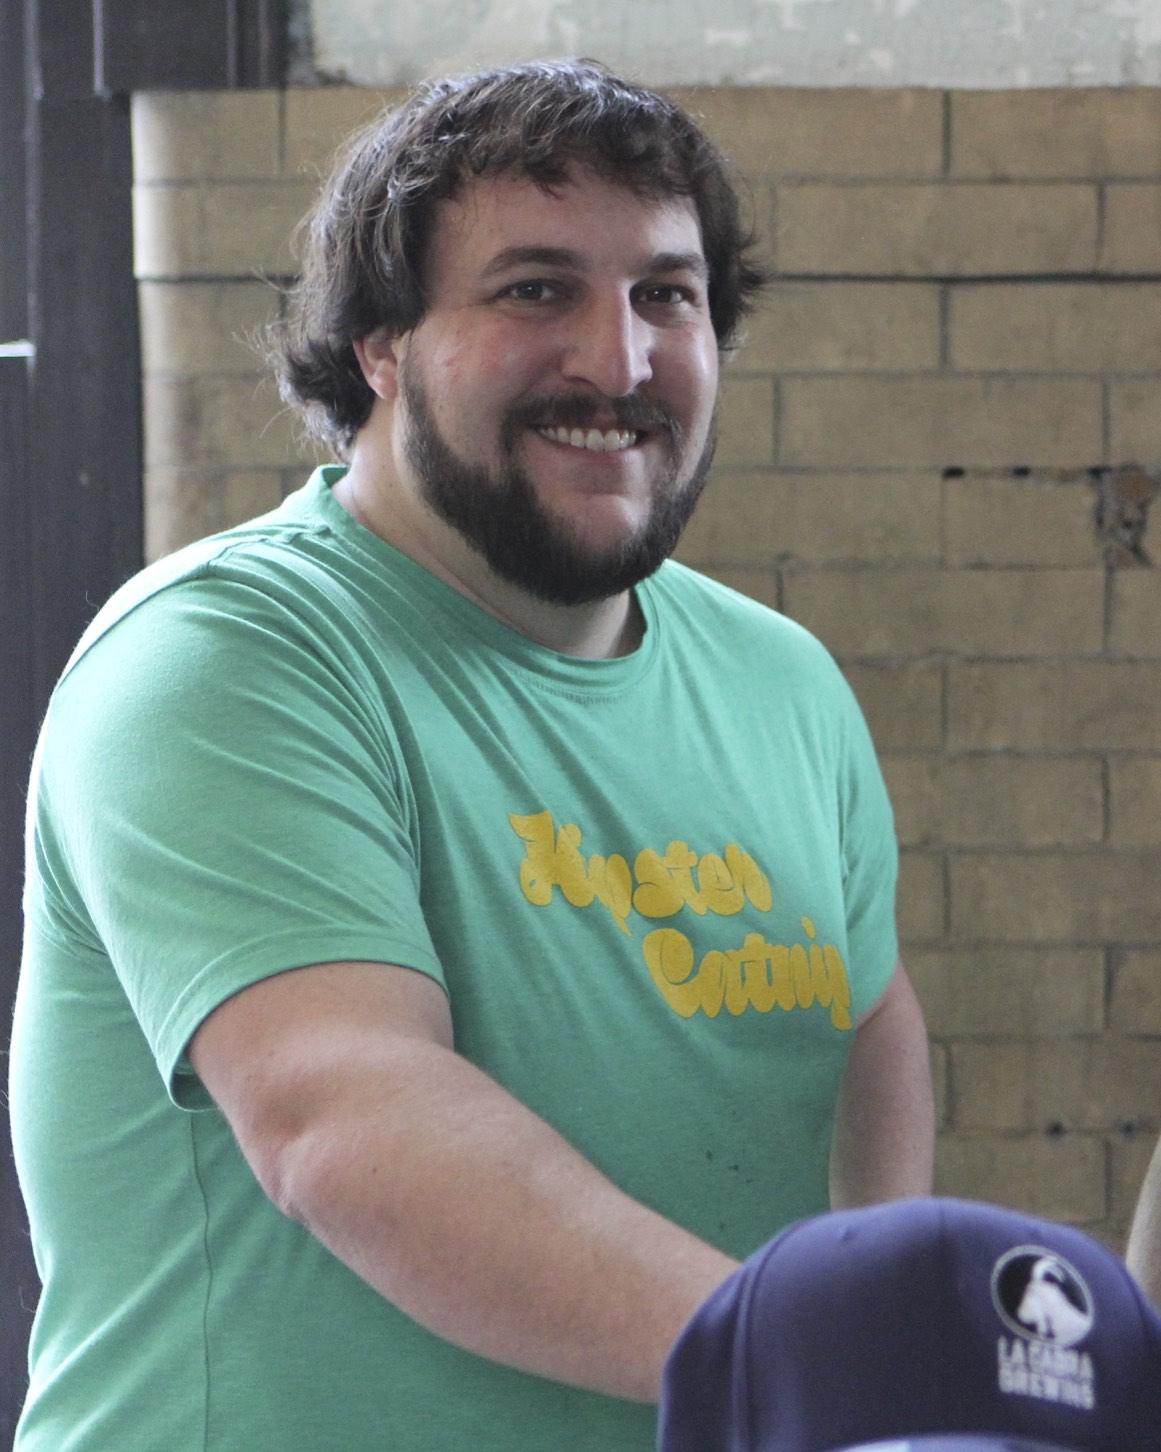 Dan Popernack, La Cabra Brewing's Partner and Brewer